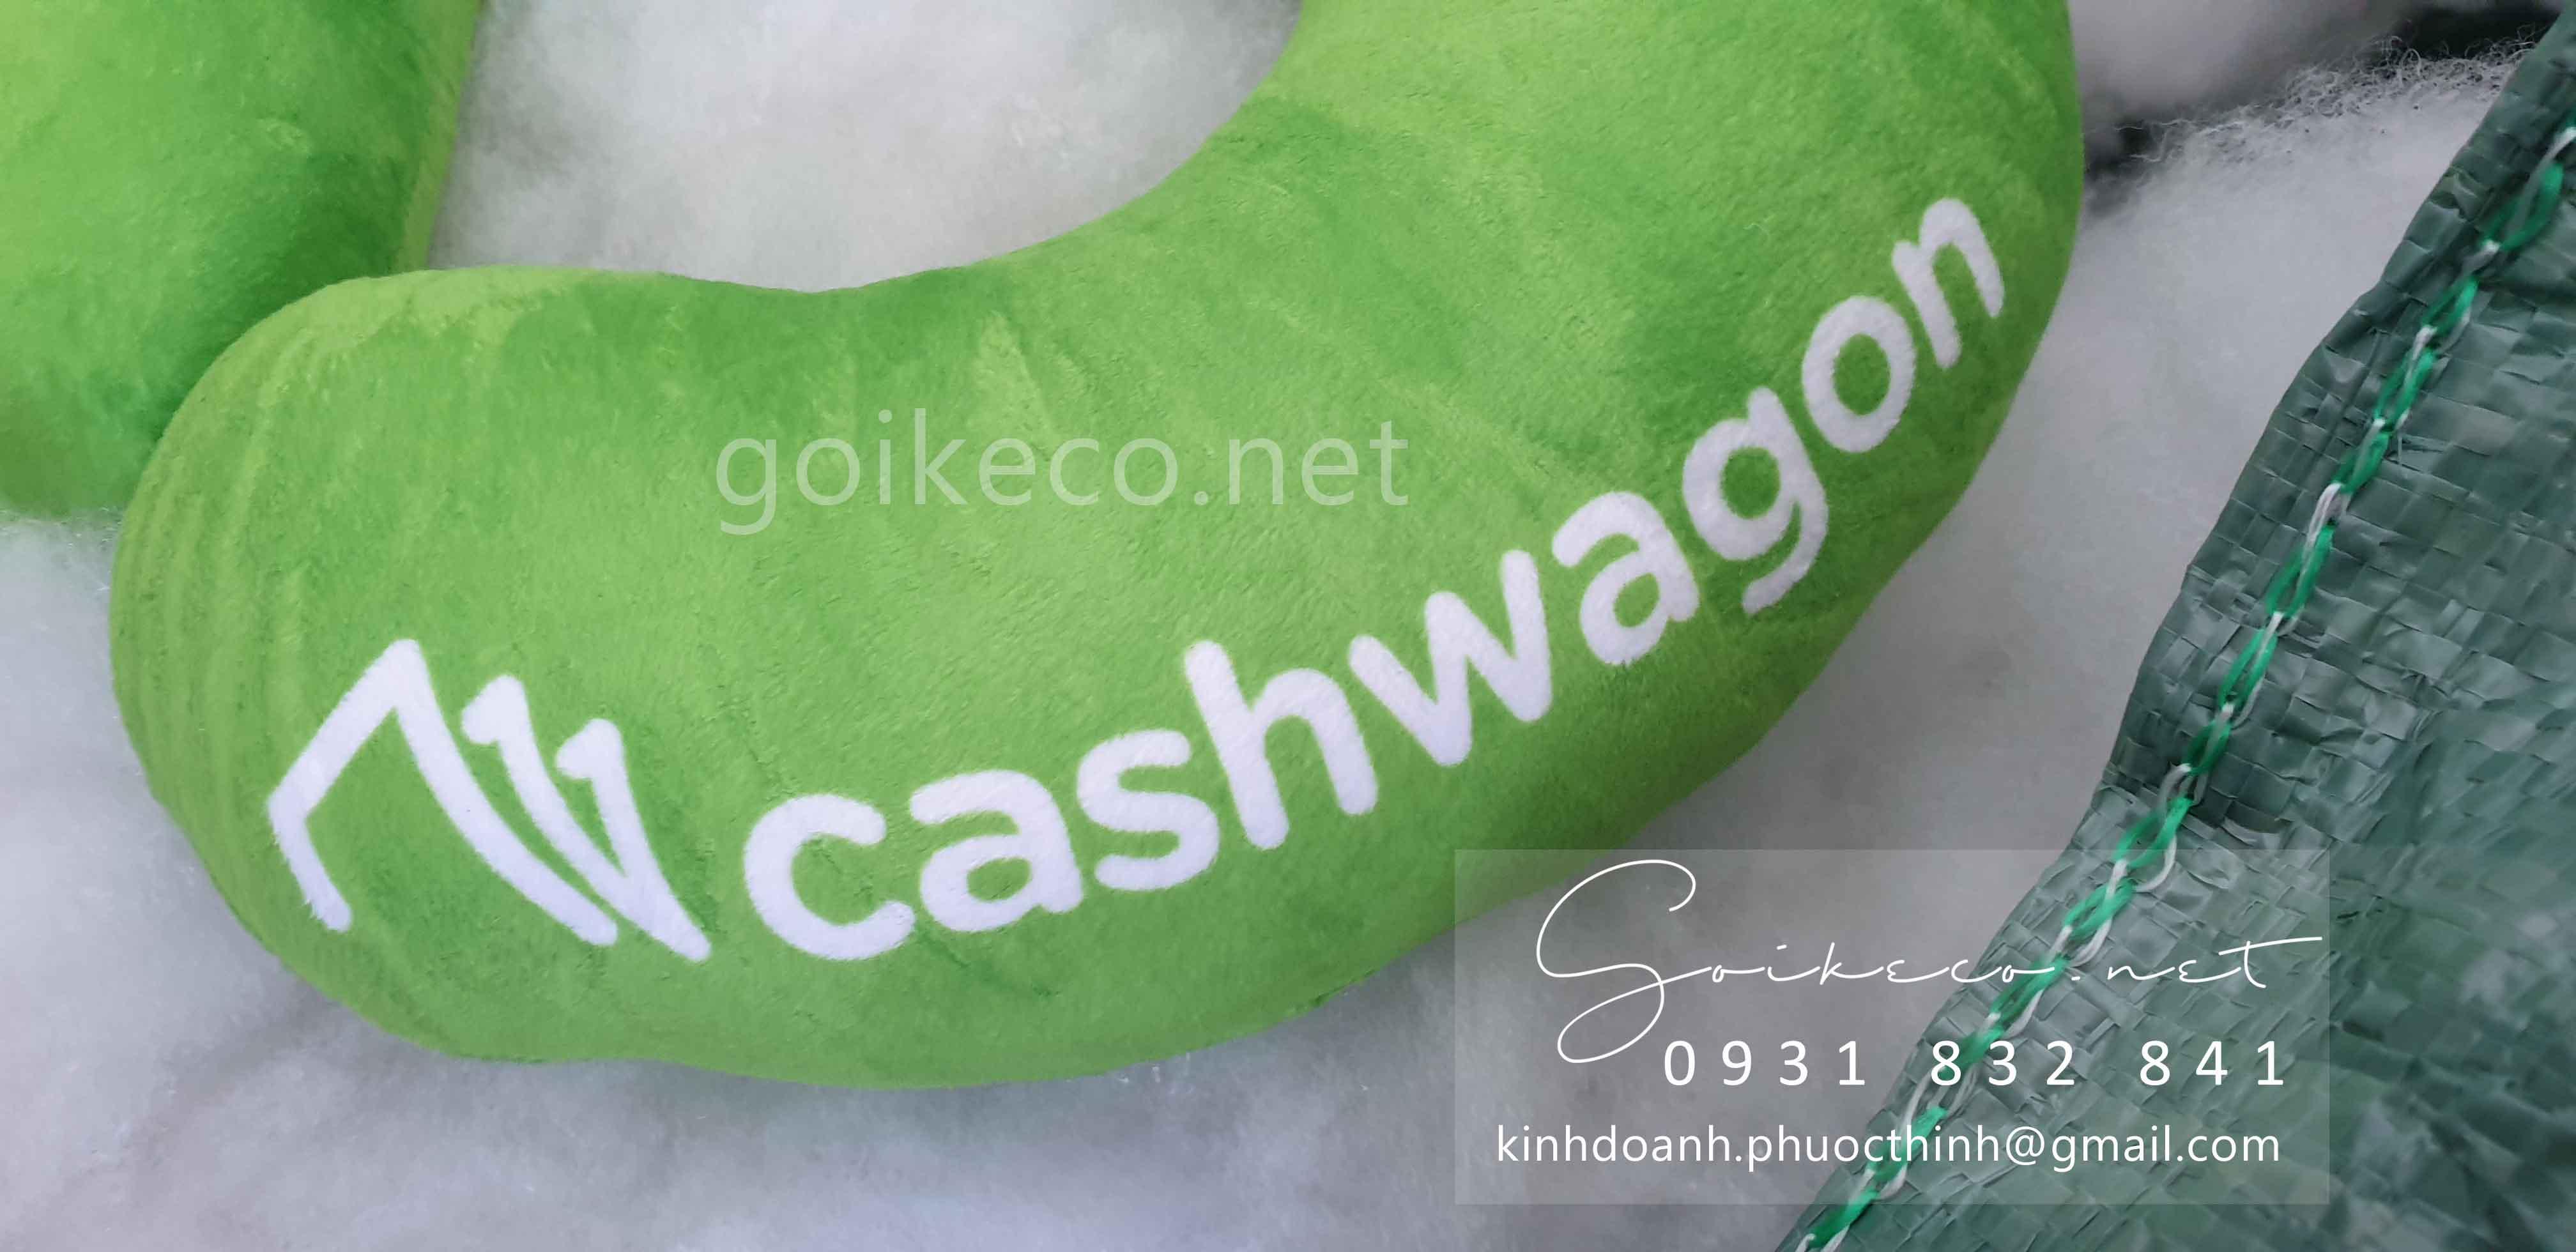 Logo Cashwagon tren goi ke co